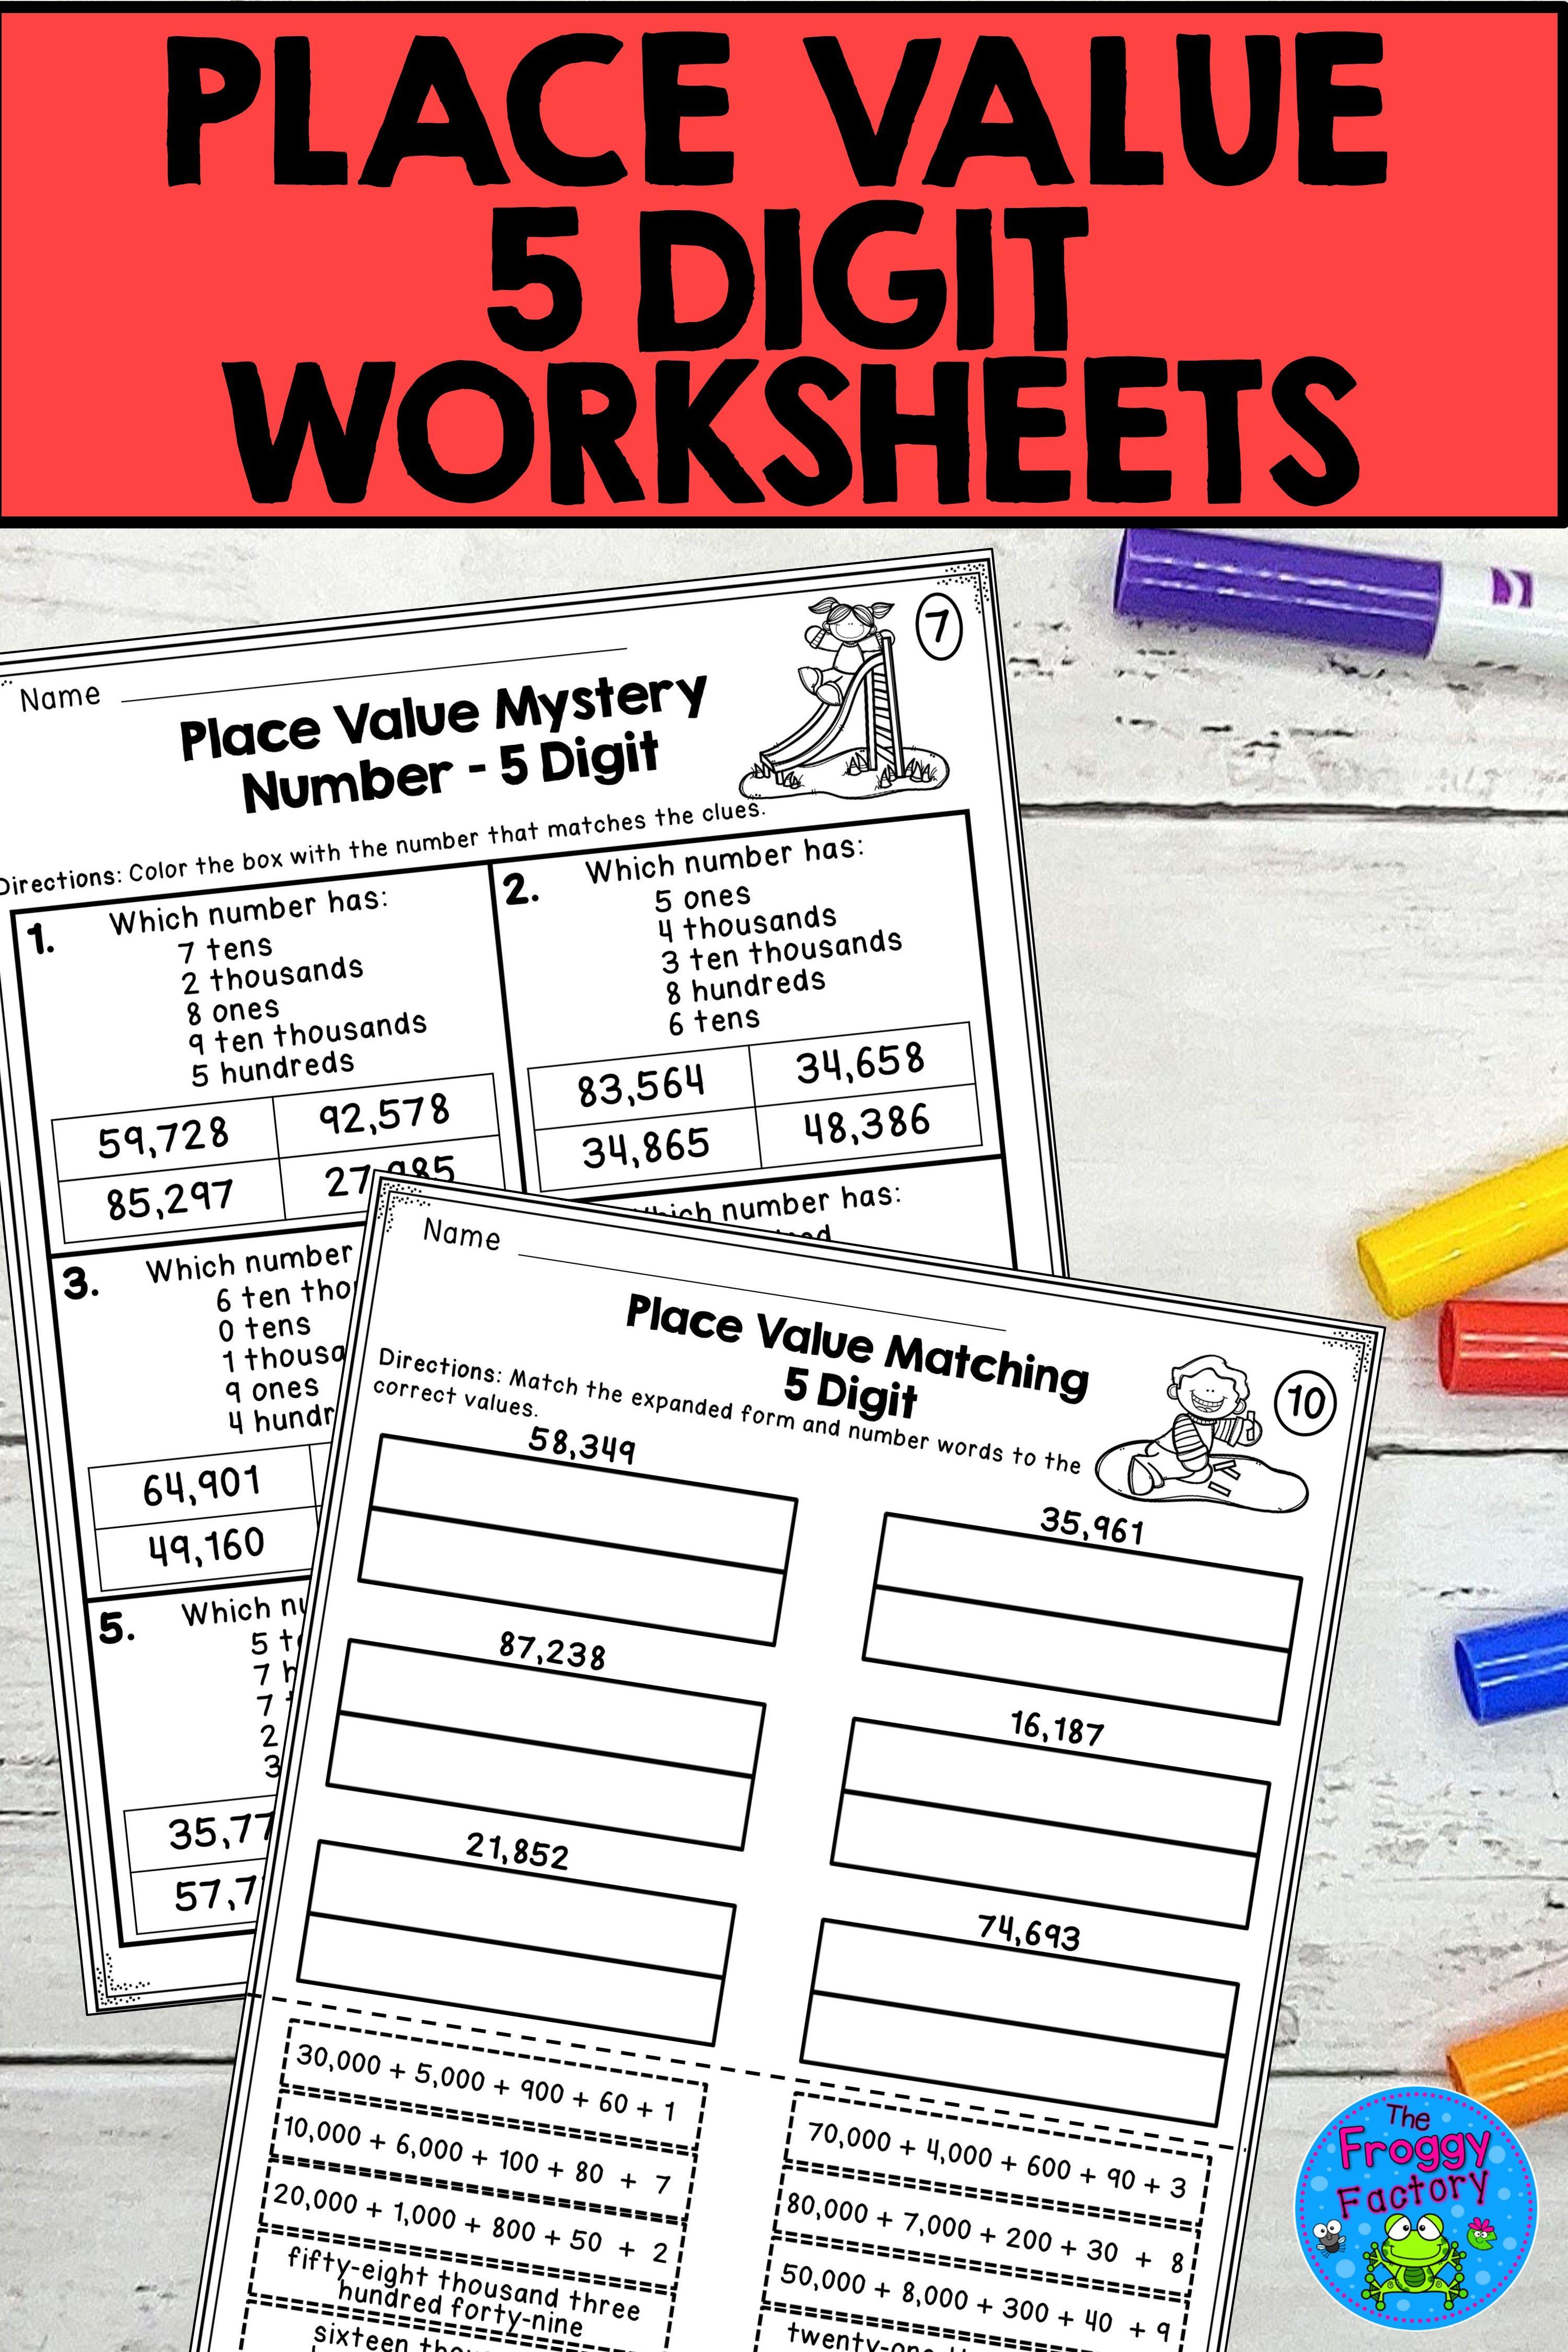 medium resolution of Place Value 5 Digit Worksheets   Place value worksheets